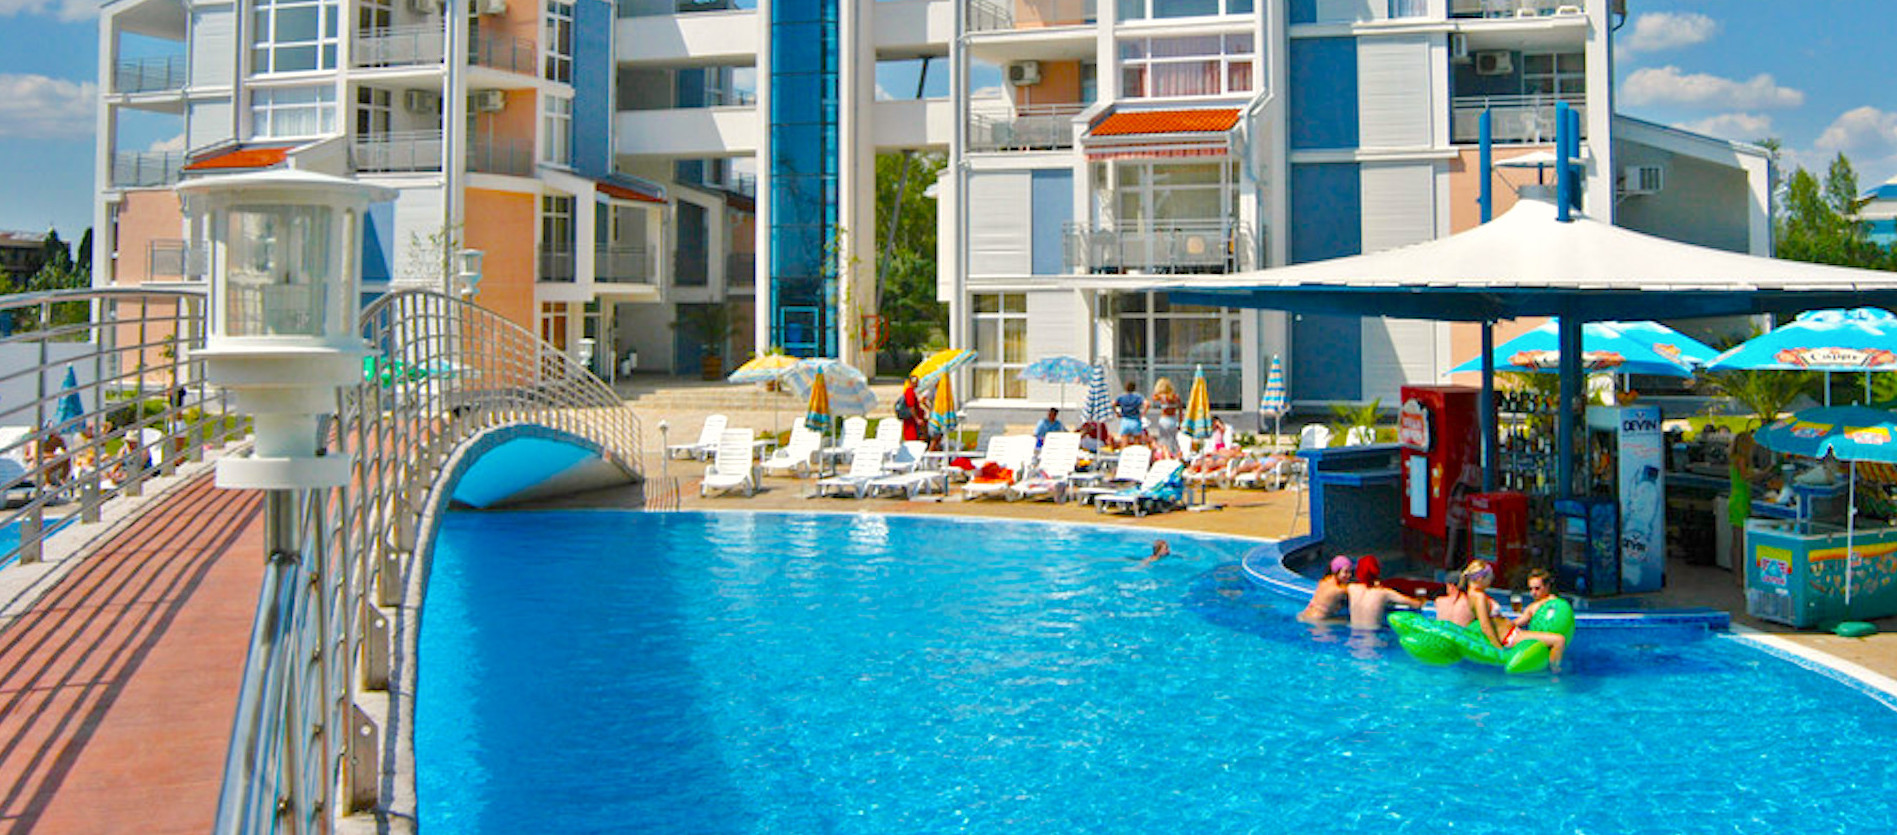 Apartments Hotel Elit 2, Sunny beach